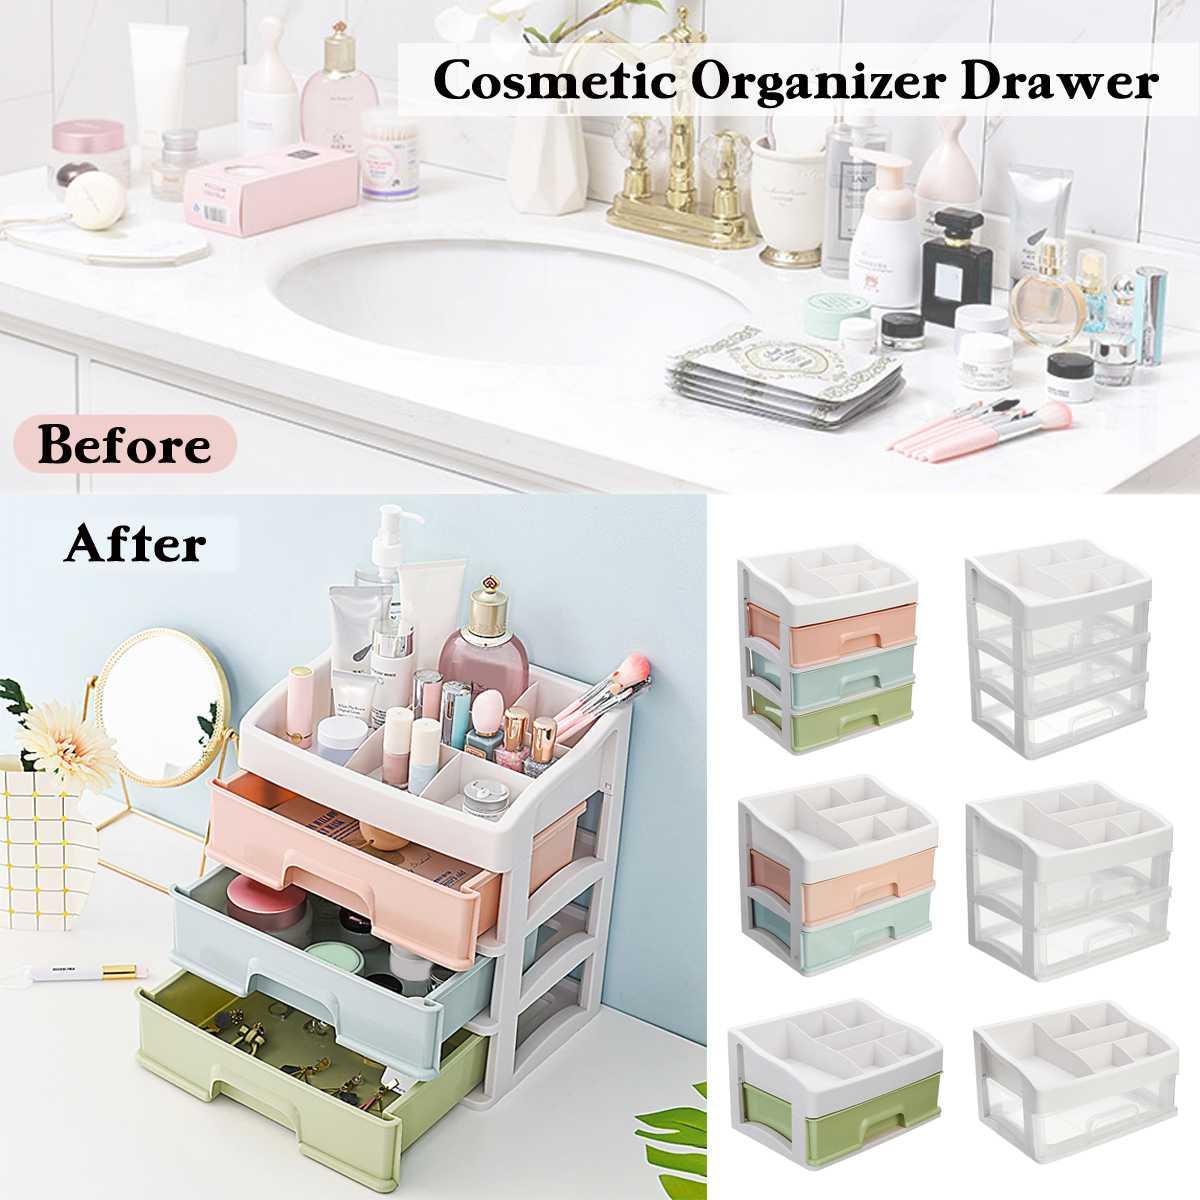 Triple Layer Plastic Comestics Make Up Storage Drawer Box Desktop Sundries Storage Case Holder Home Office Display Organizer soccer-specific stadium